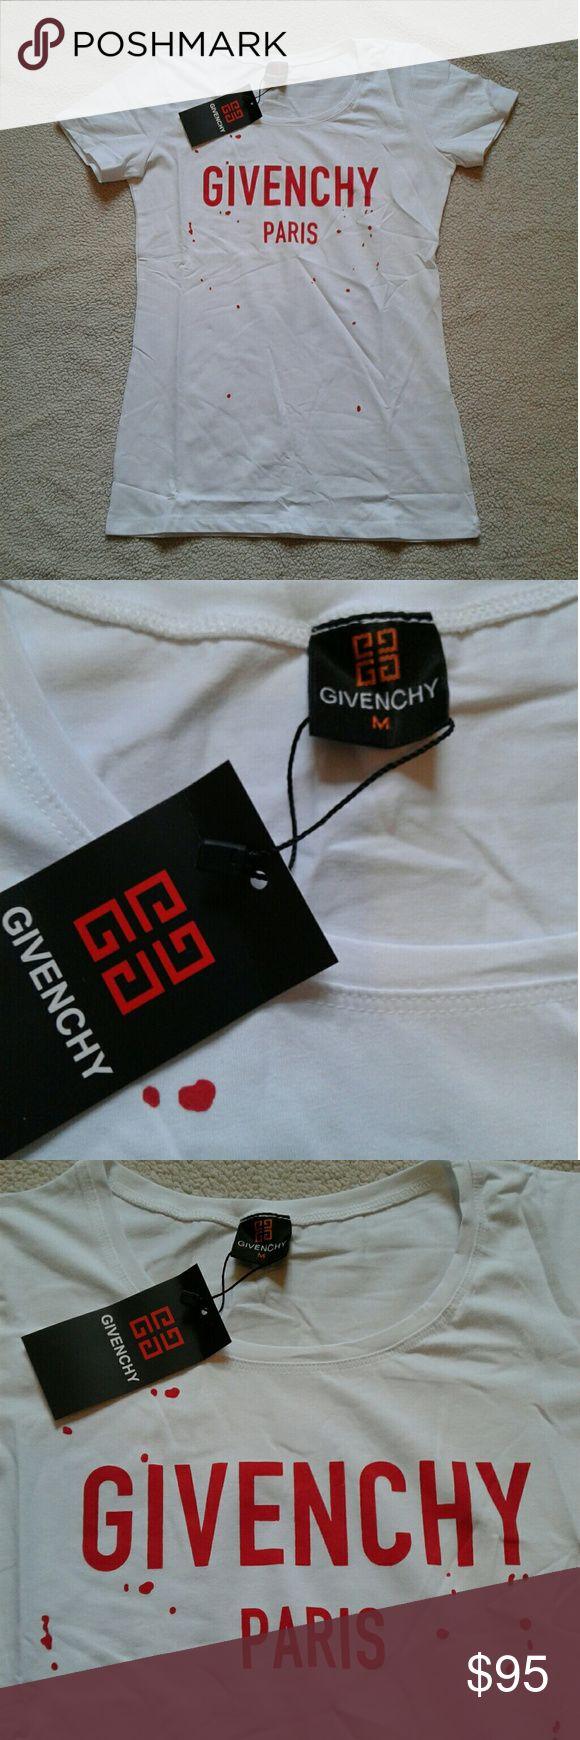 2- Givenchy Paris Shirt New w Tags  2- Givenchy shirt women's  SHIPS SAME DAY BEFORE 4PM OR NEXT DAY Givenchy Tops Tees - Short Sleeve